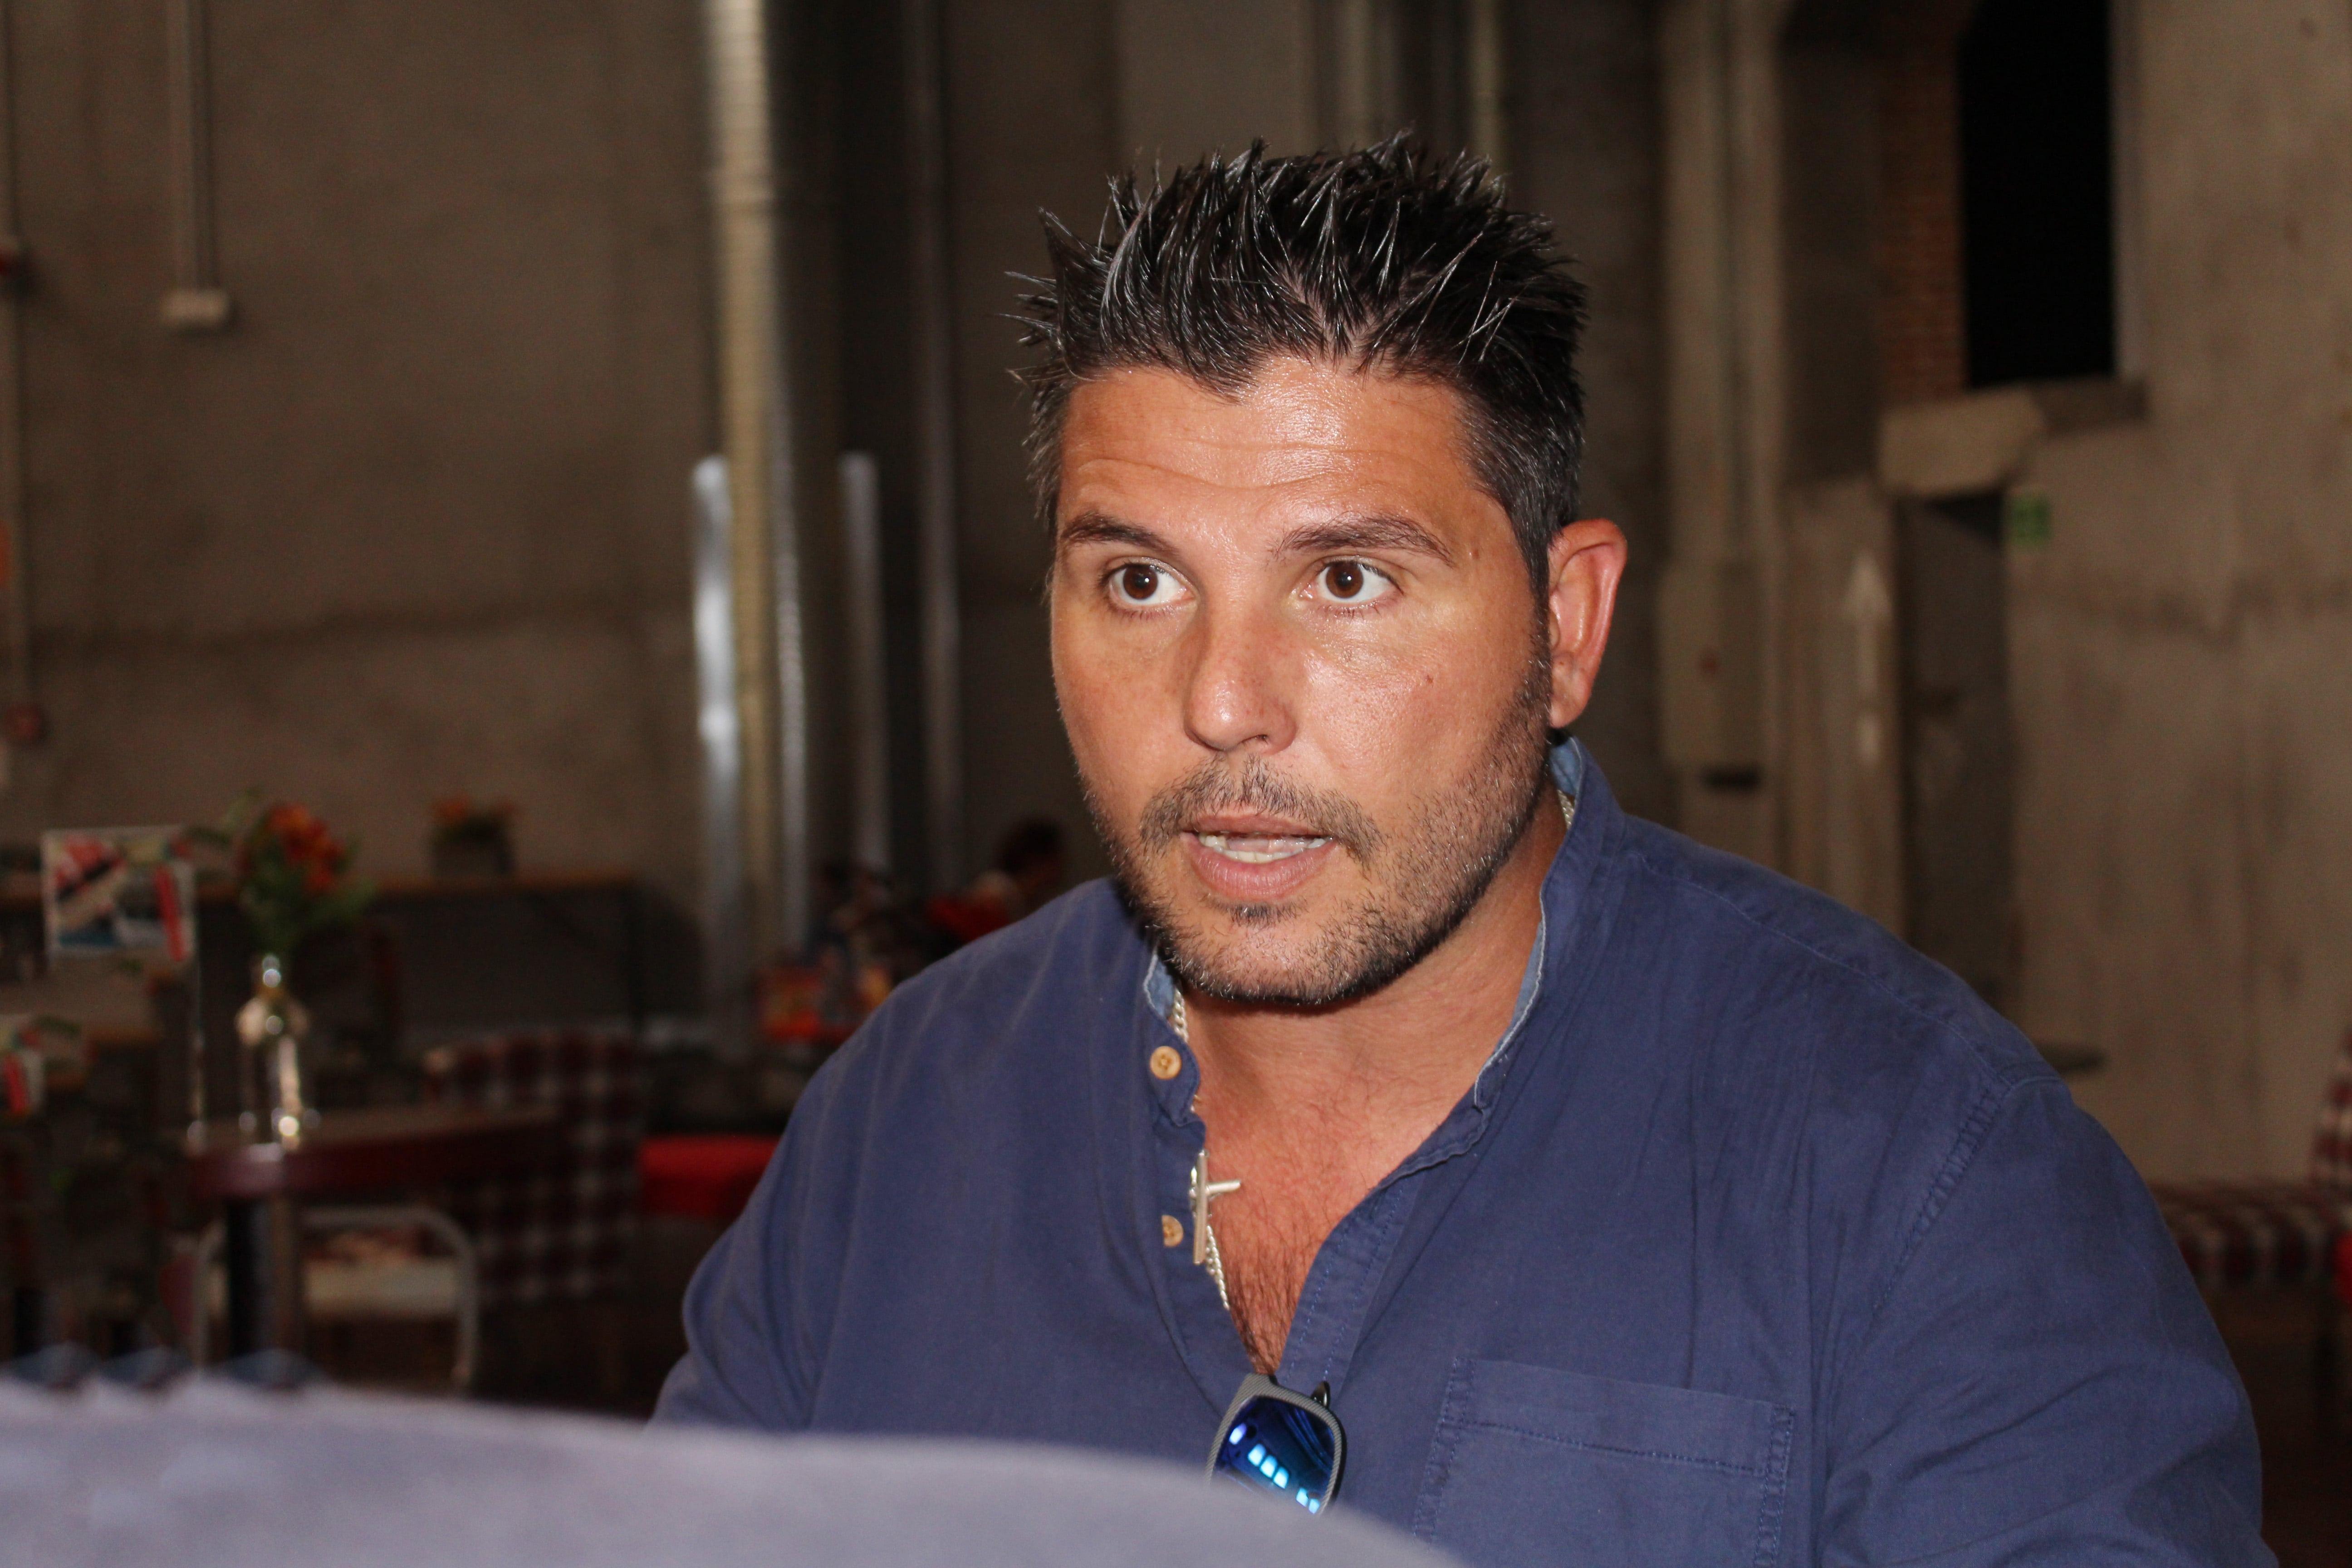 Javier Baños